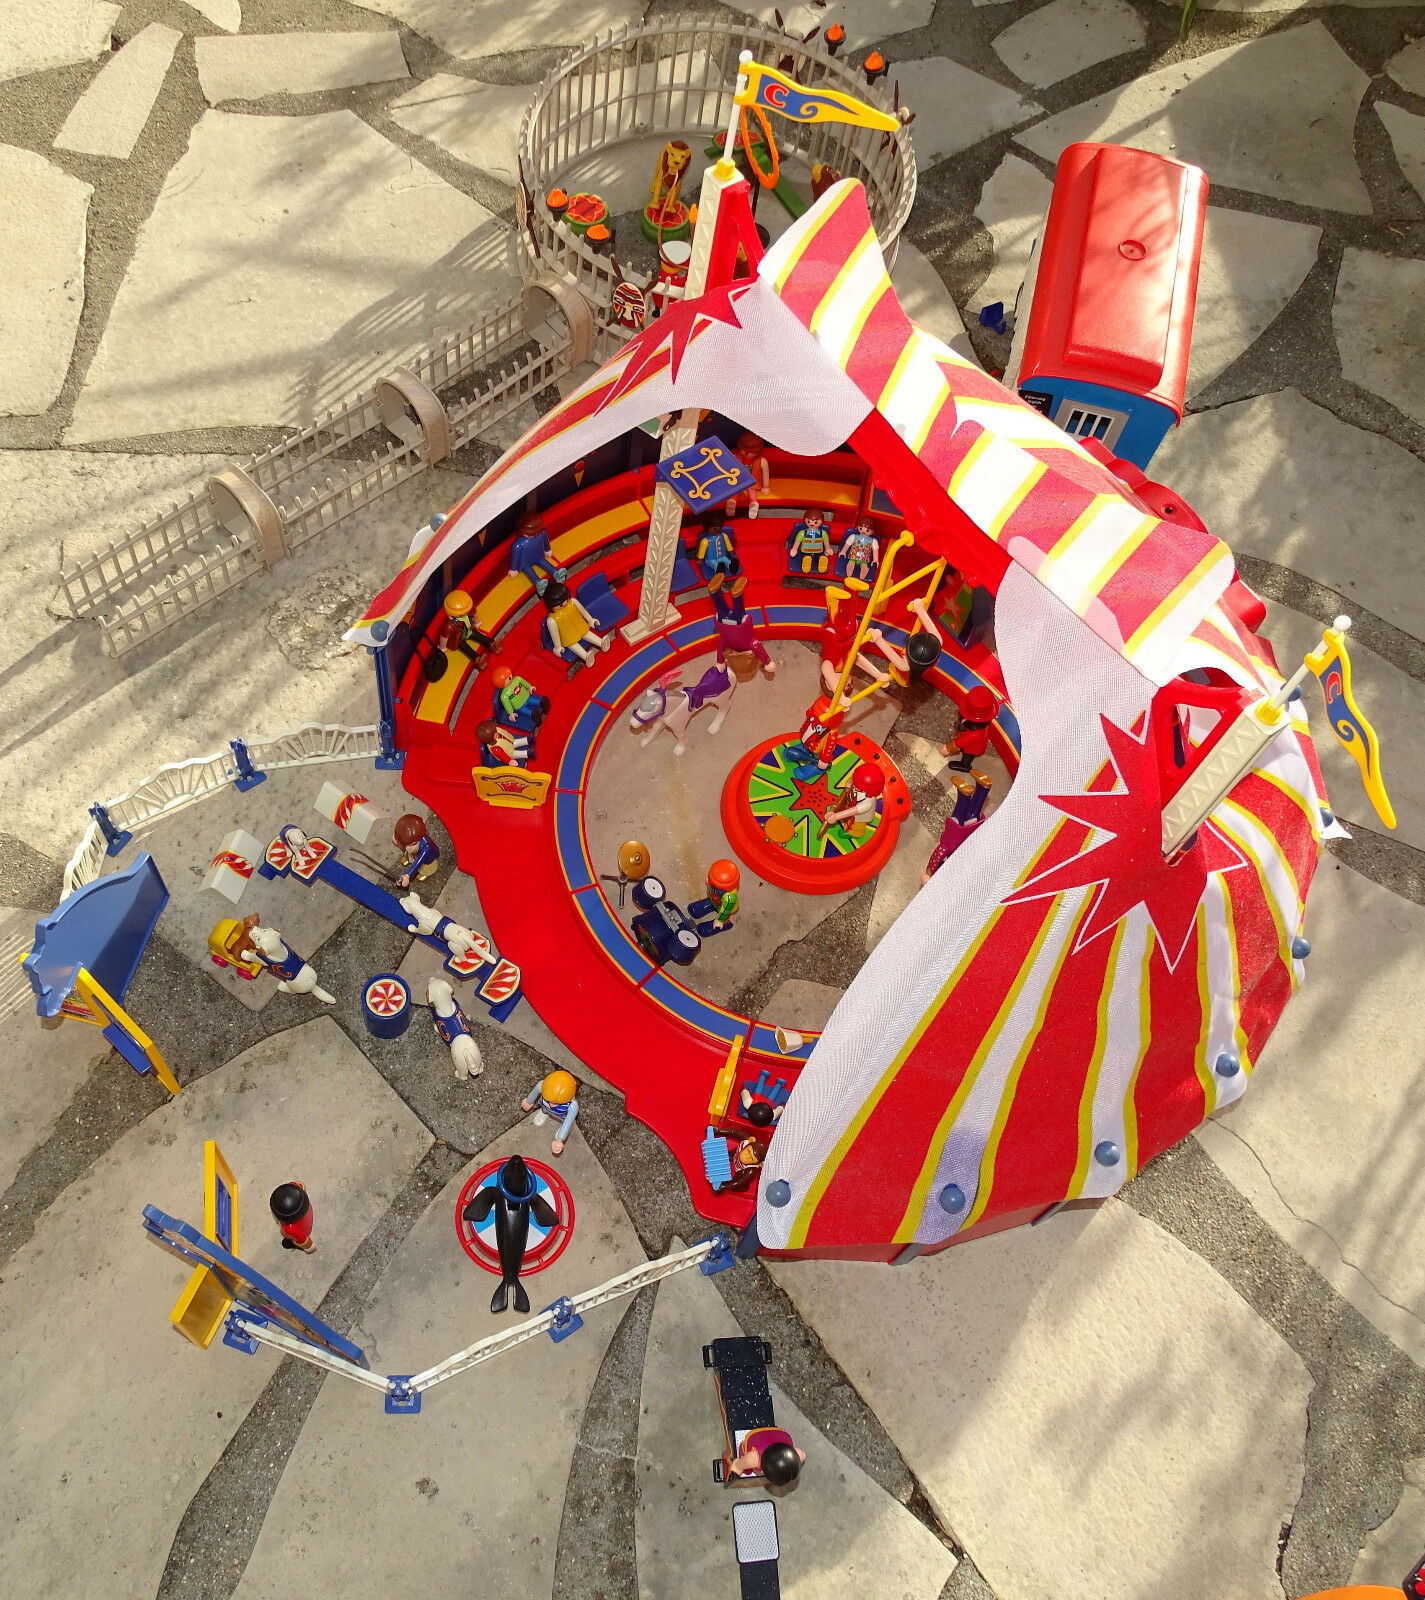 Achats de Noël PLAYMOBIL GRAND CIRQUE PLAYMOBIL 4230 NOMBREUX PERSONNAGES PERSONNAGES PERSONNAGES ACCESSOIRES ROULOTTE 85fa8c